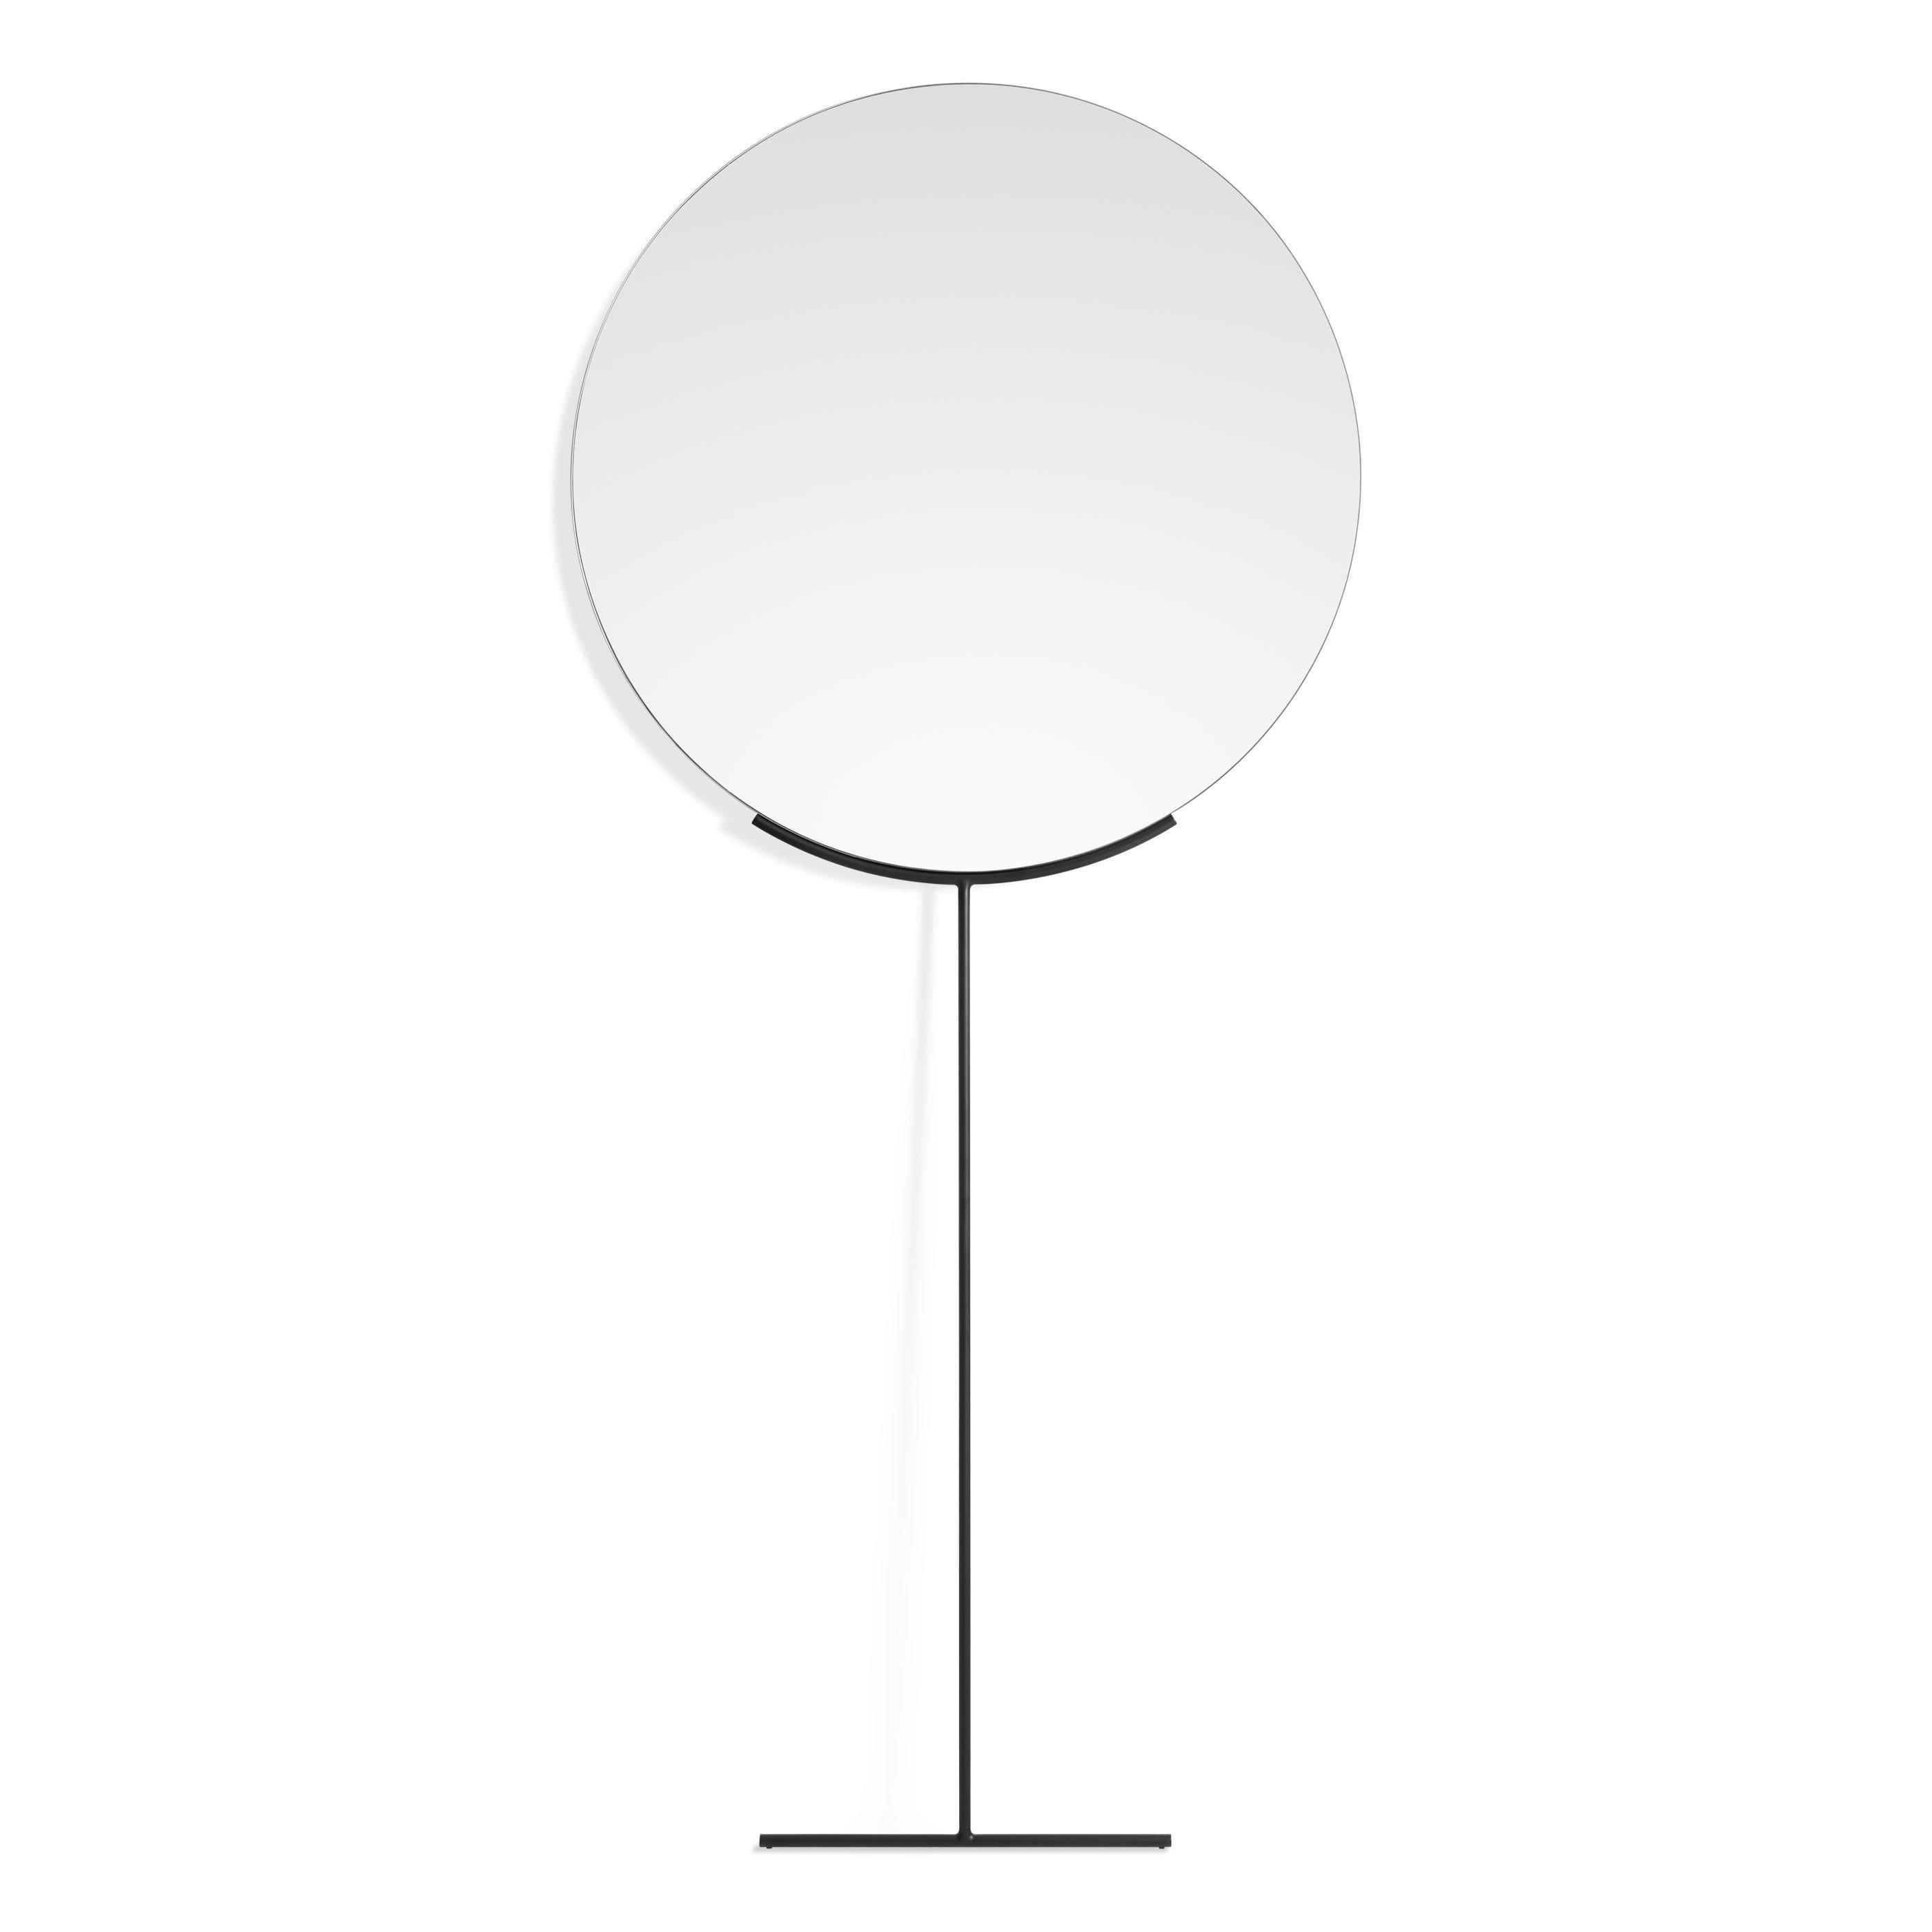 Rune Leaning Mirror